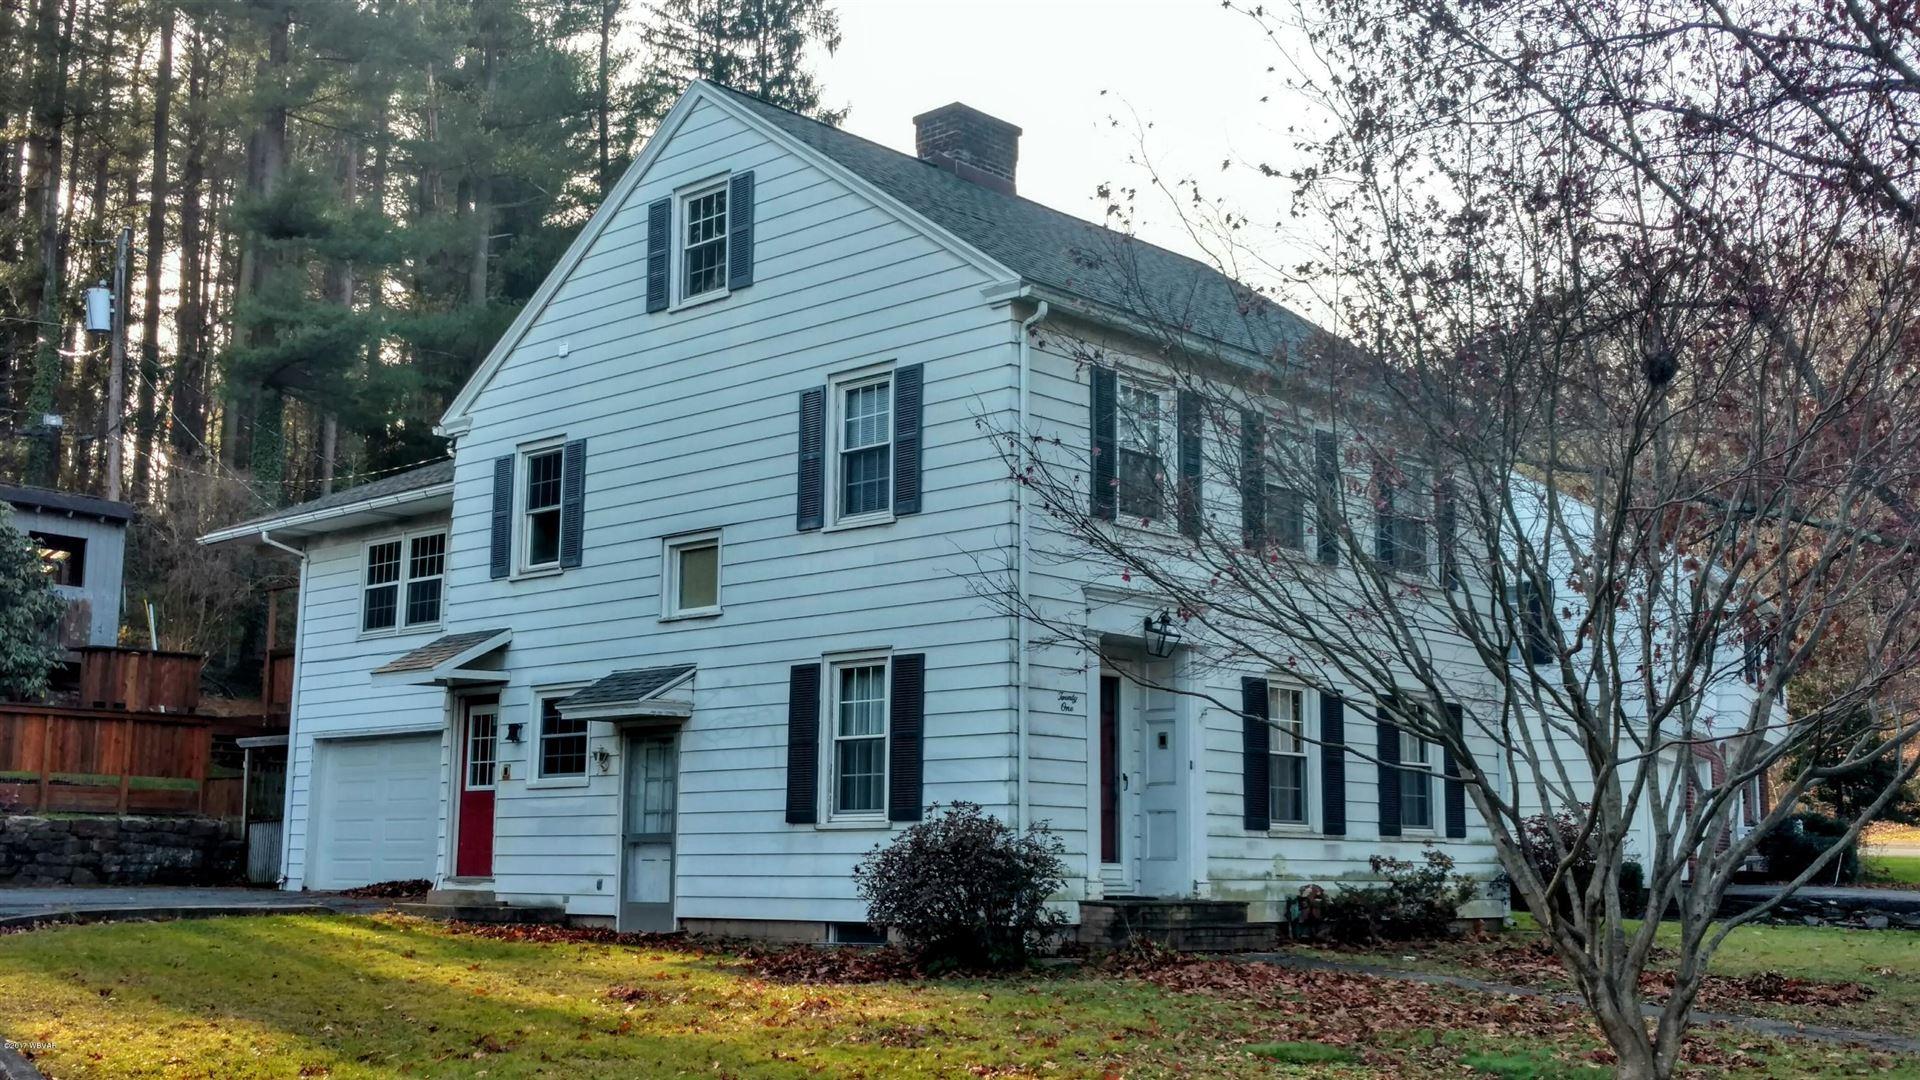 21 ROUND HILL ROAD, Williamsport, PA 17701 - #: WB-85669